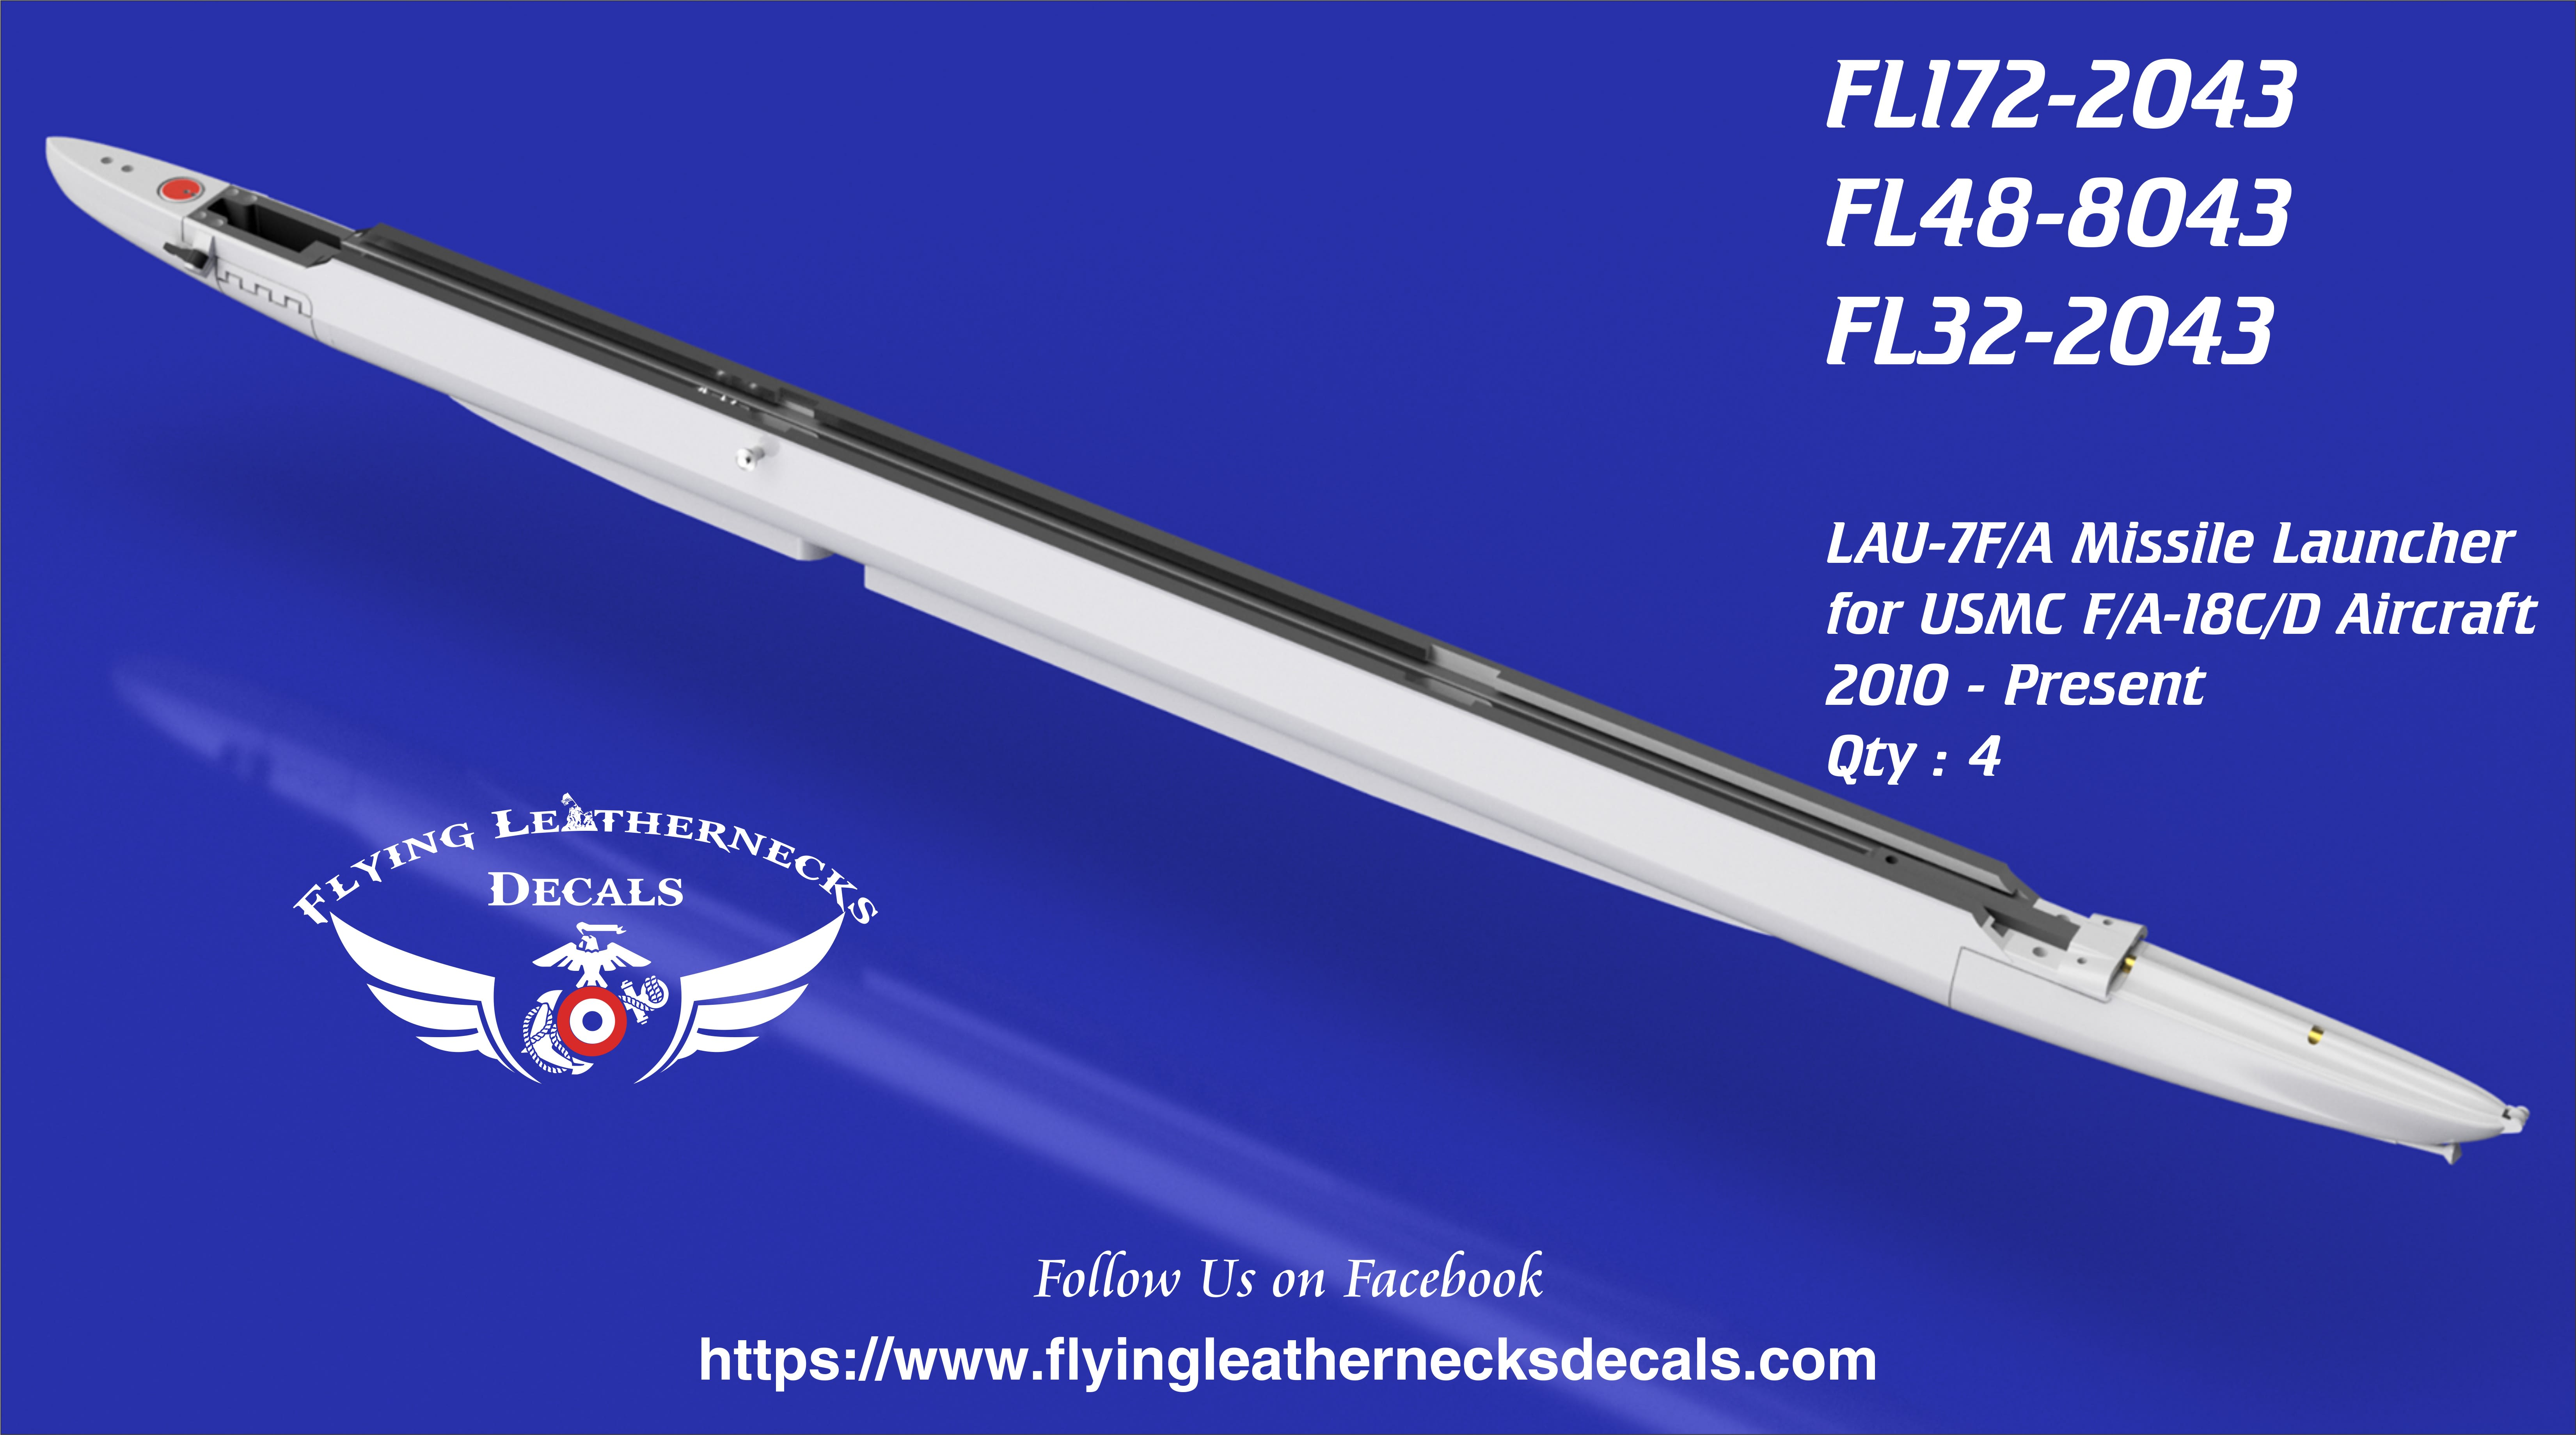 FL172-2043